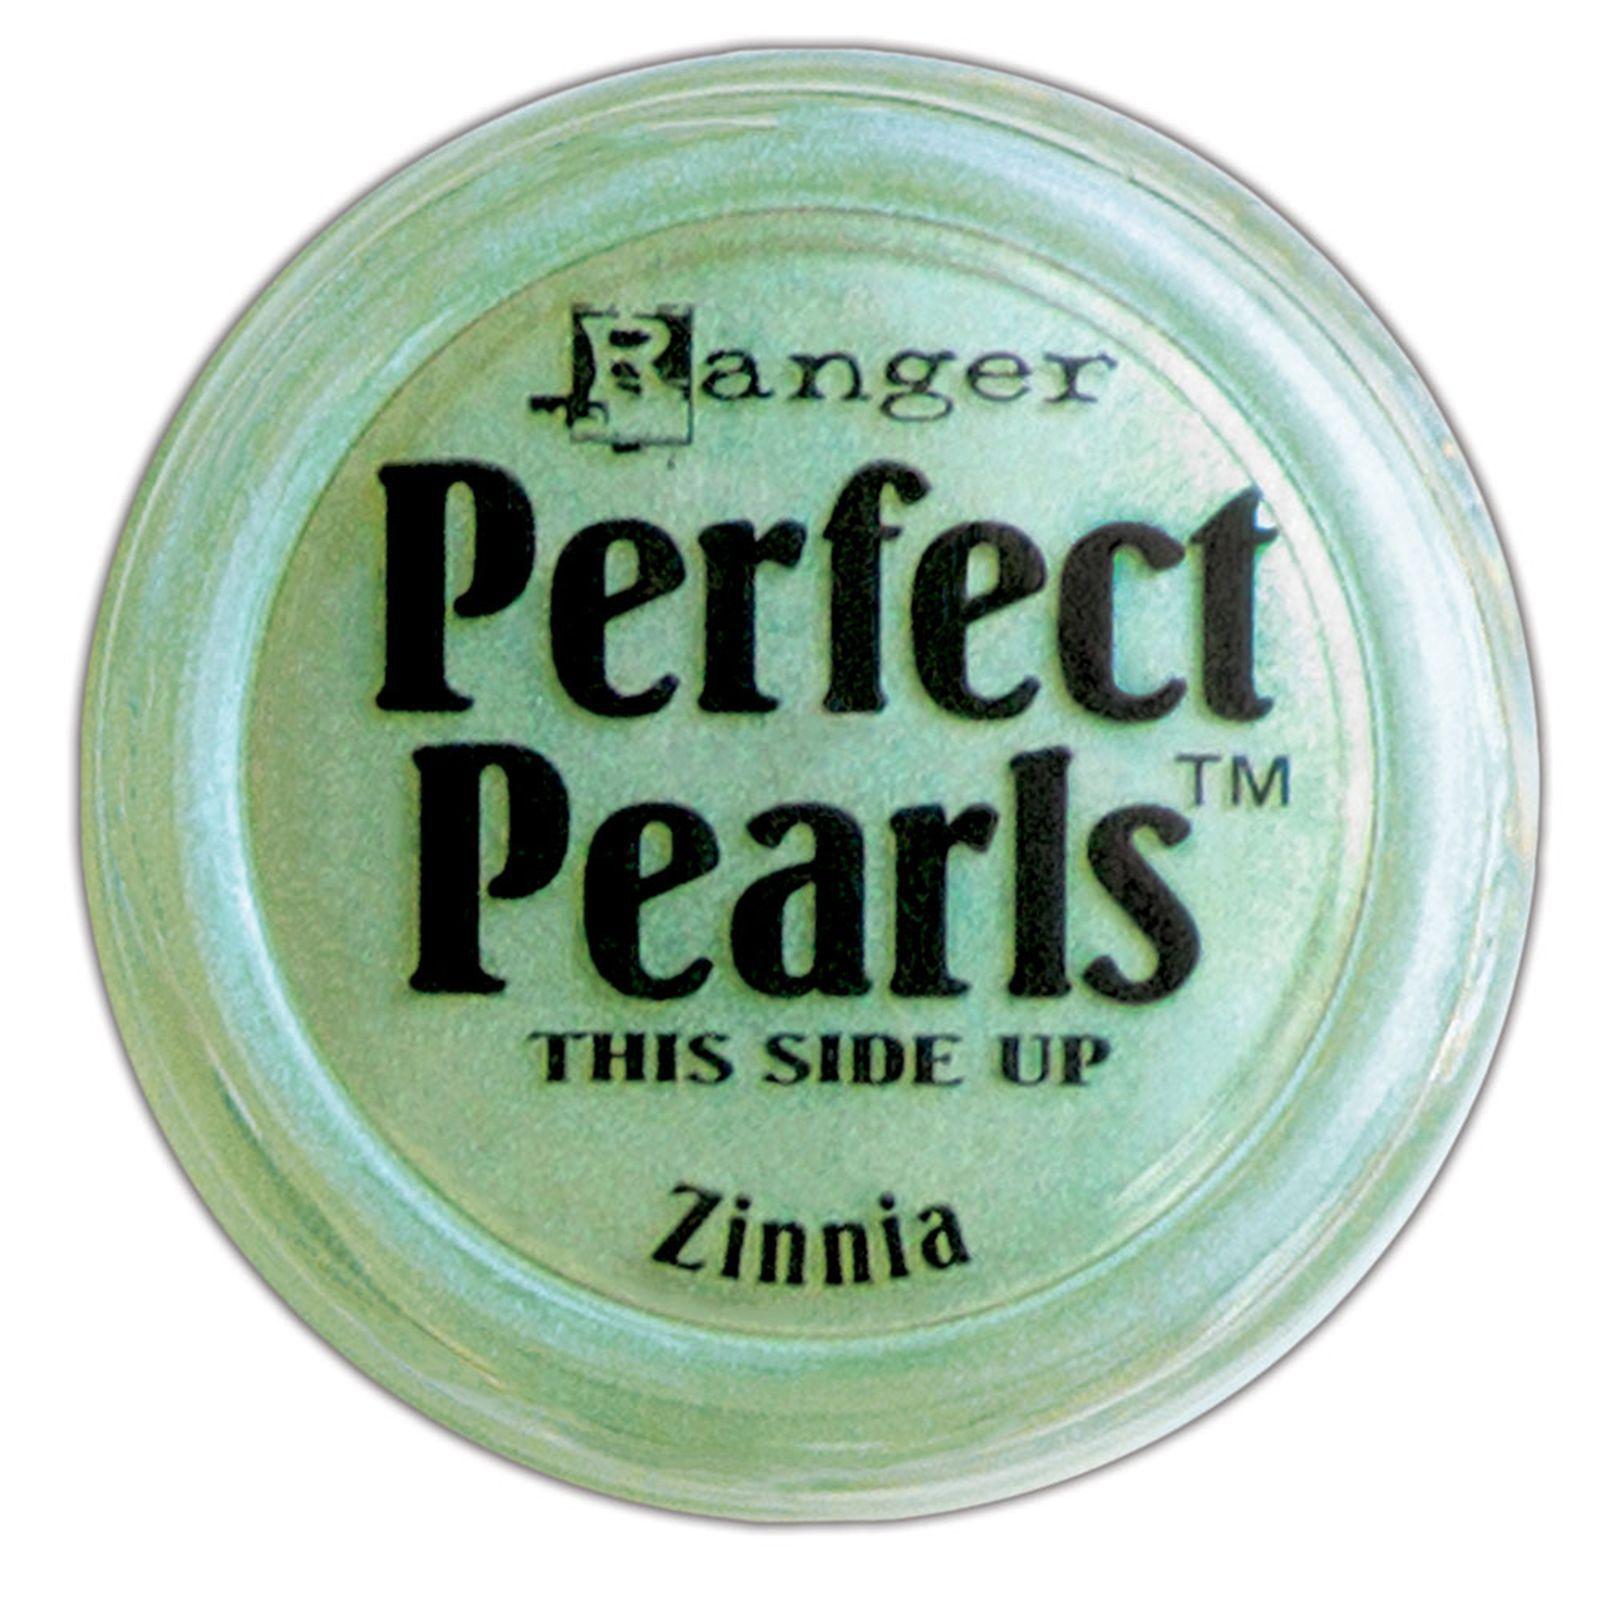 Perfect pearl pigment powder - zinnia